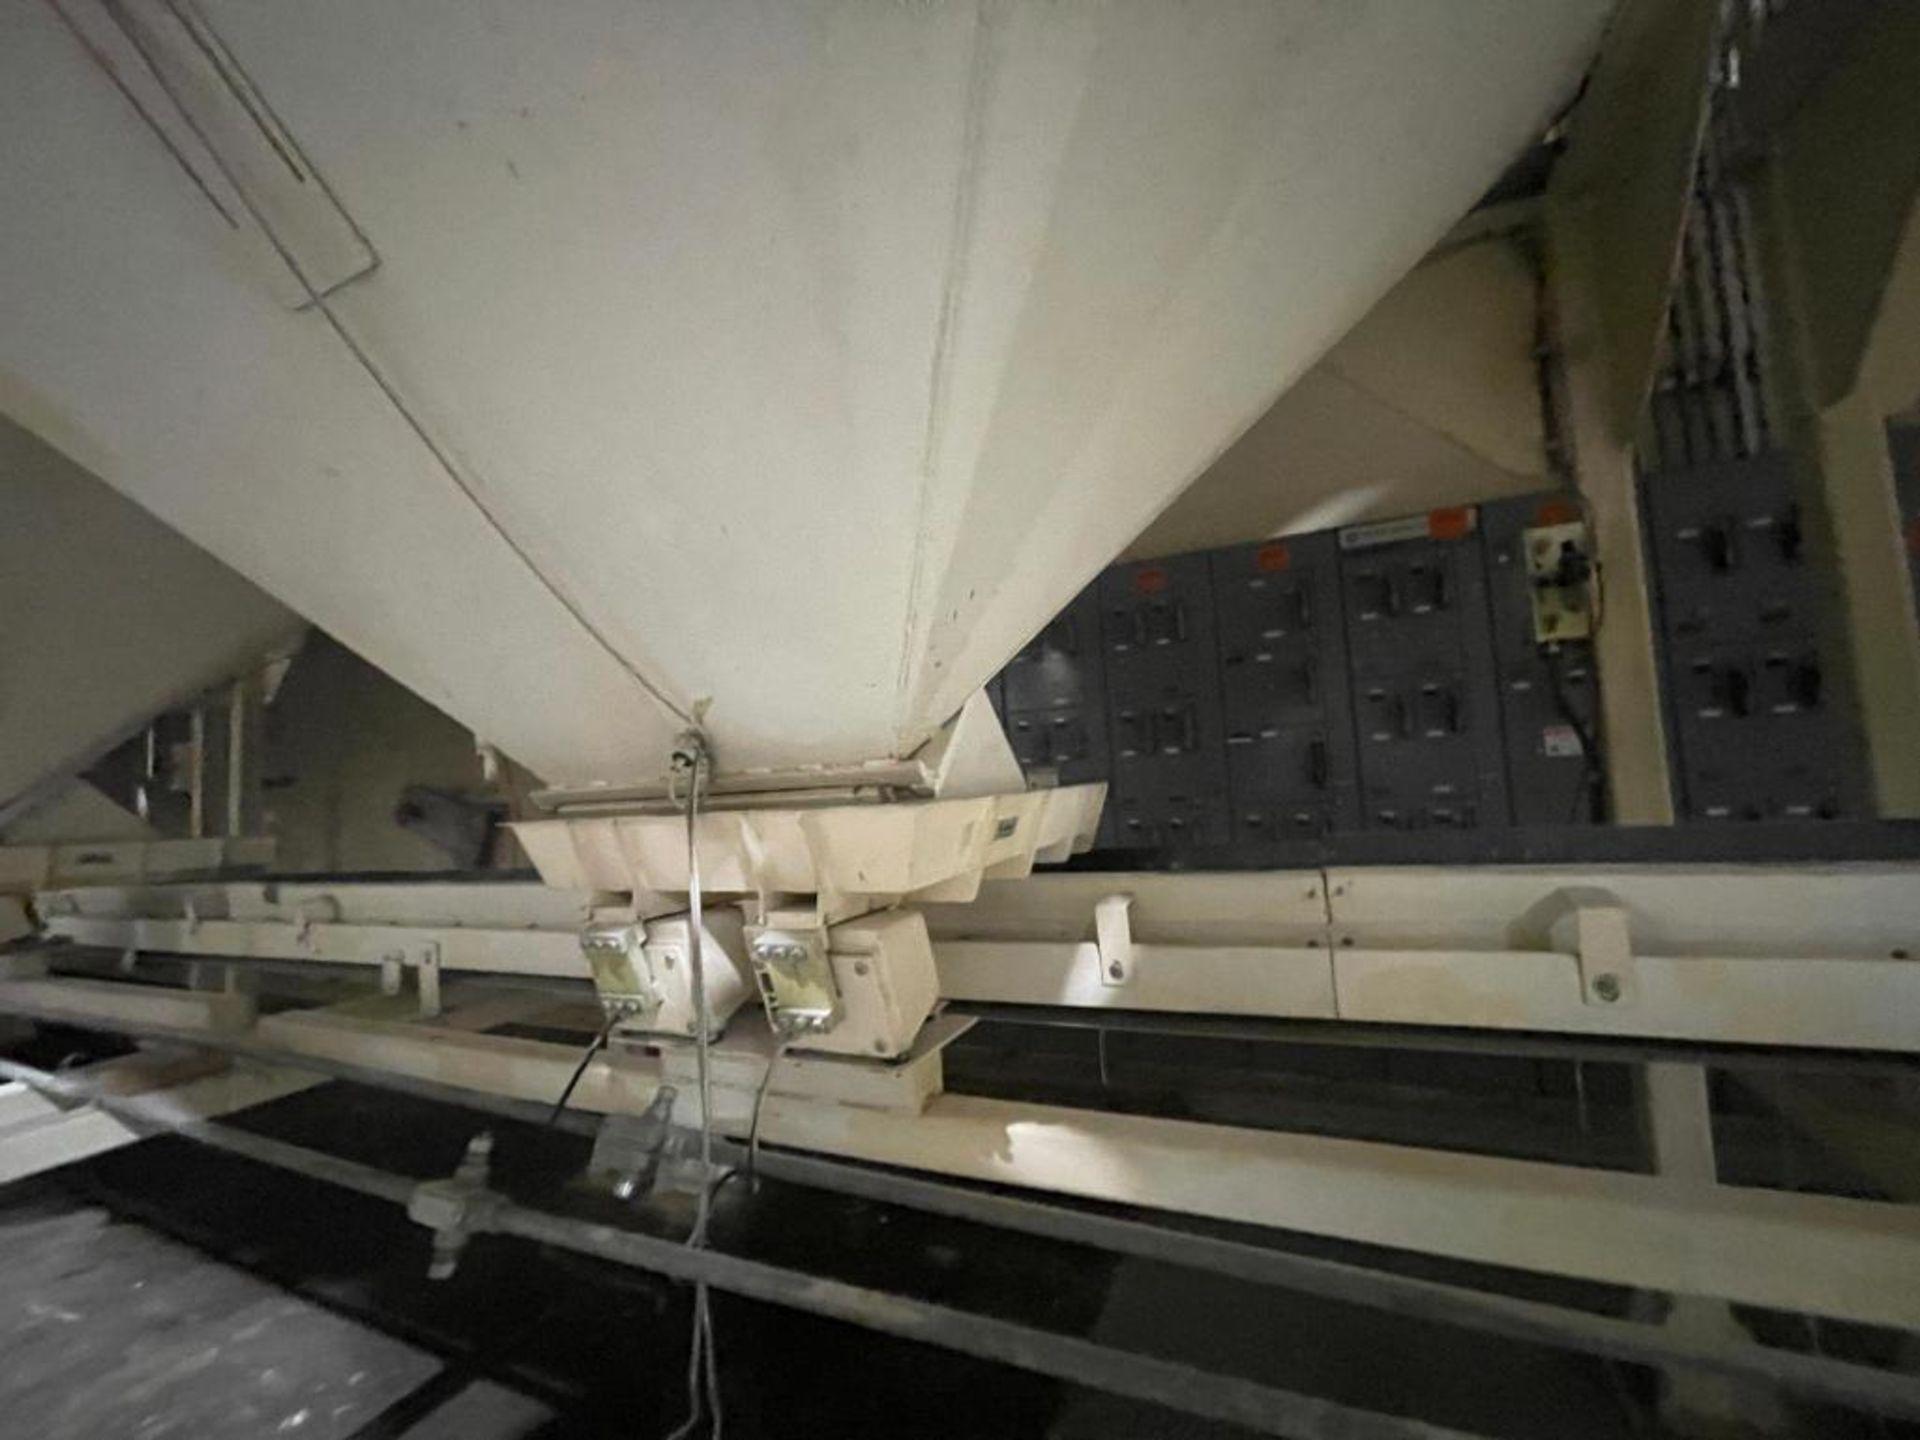 Aseeco mild steel cone bottom bulk storage bin - Image 15 of 31